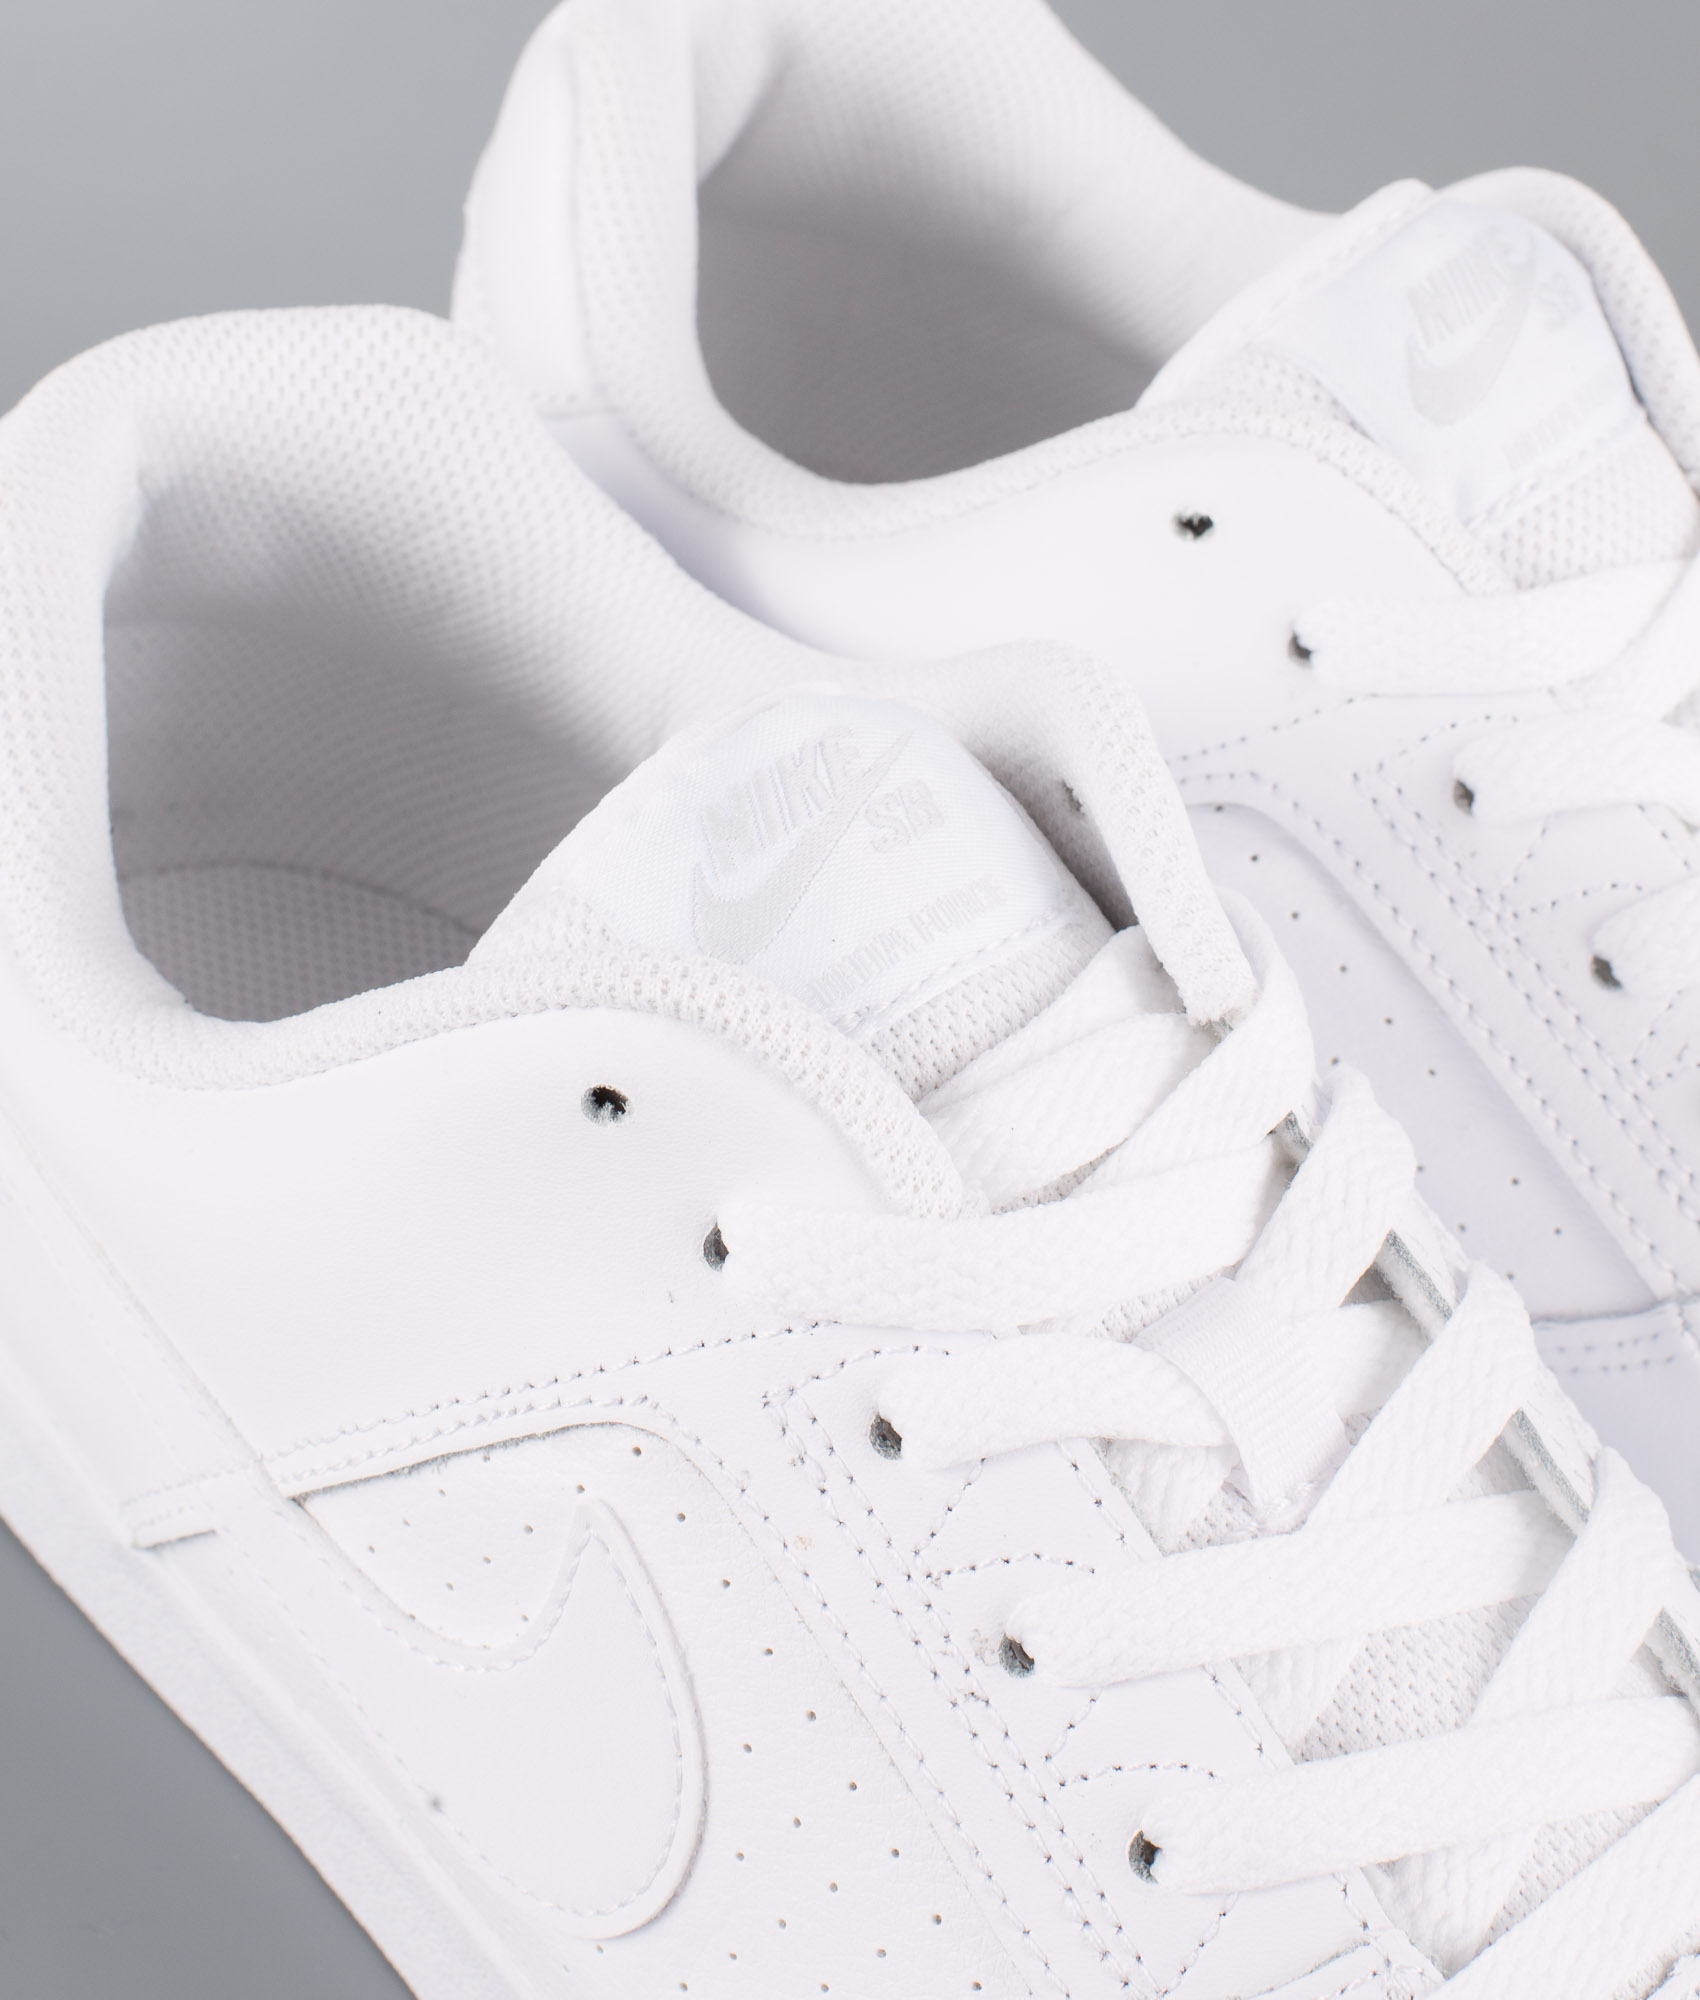 fi Delta Kengät Force White Whitewhite Nike Vulc Ridestore 0dCqwWg